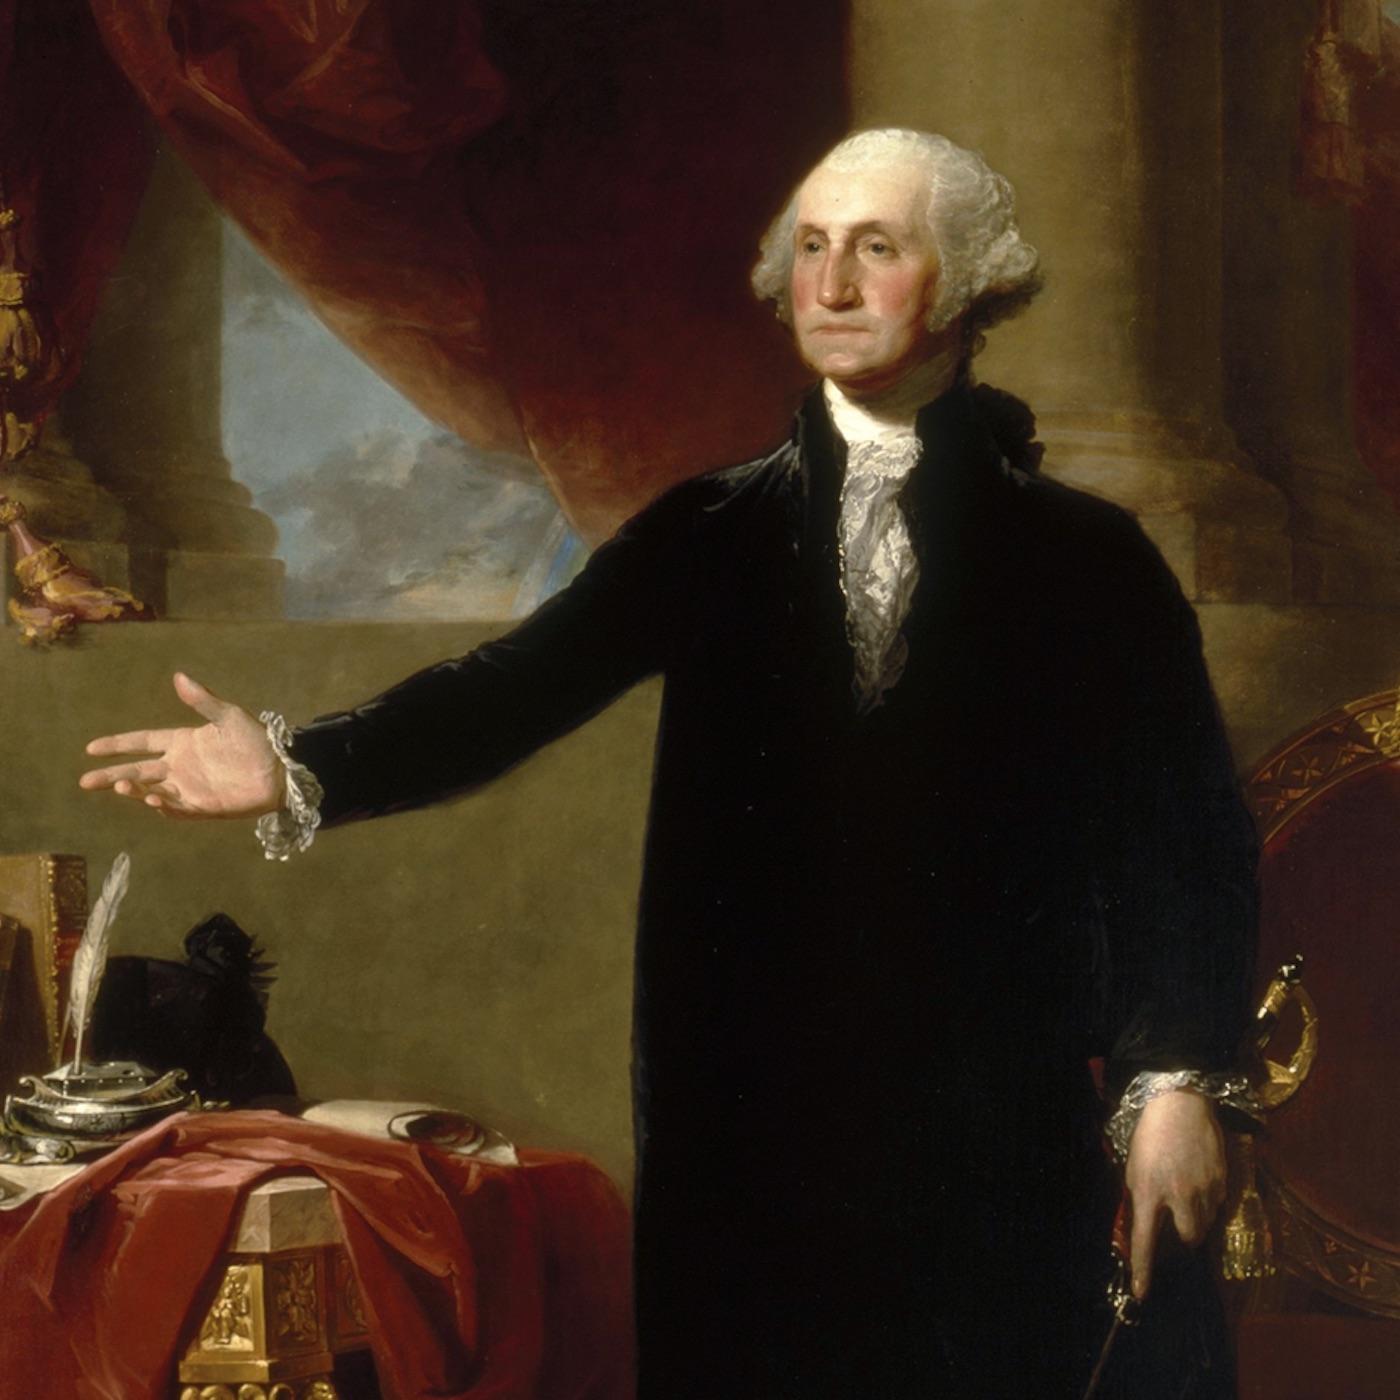 Gilbert Stuart's standing portrait of George Washington symbolizes Washington's role in the achievements of the American Revolution.